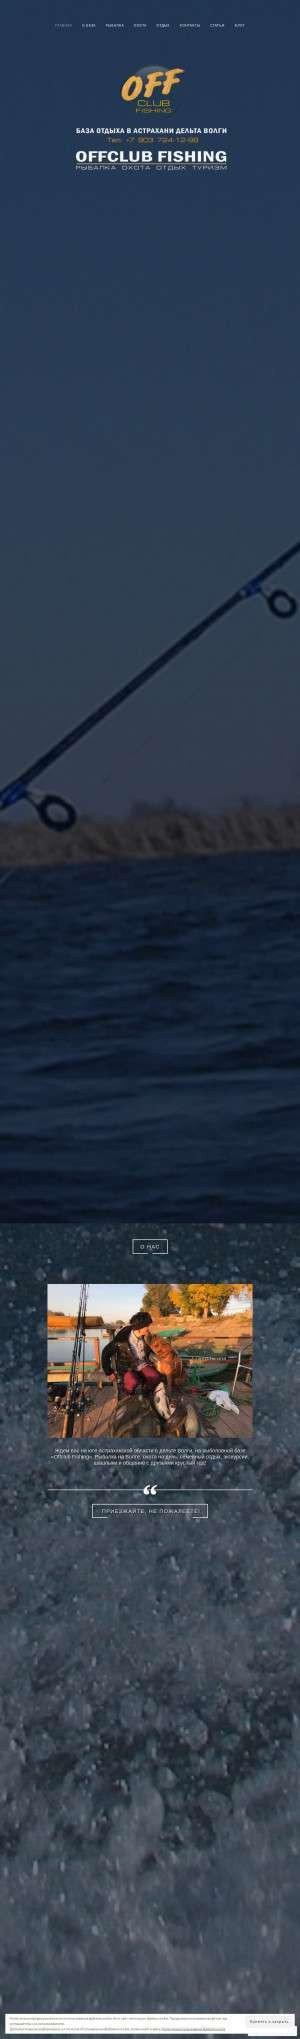 Предпросмотр для offclubfishing.com — Рыболовная база отдыха Offclub Fishing